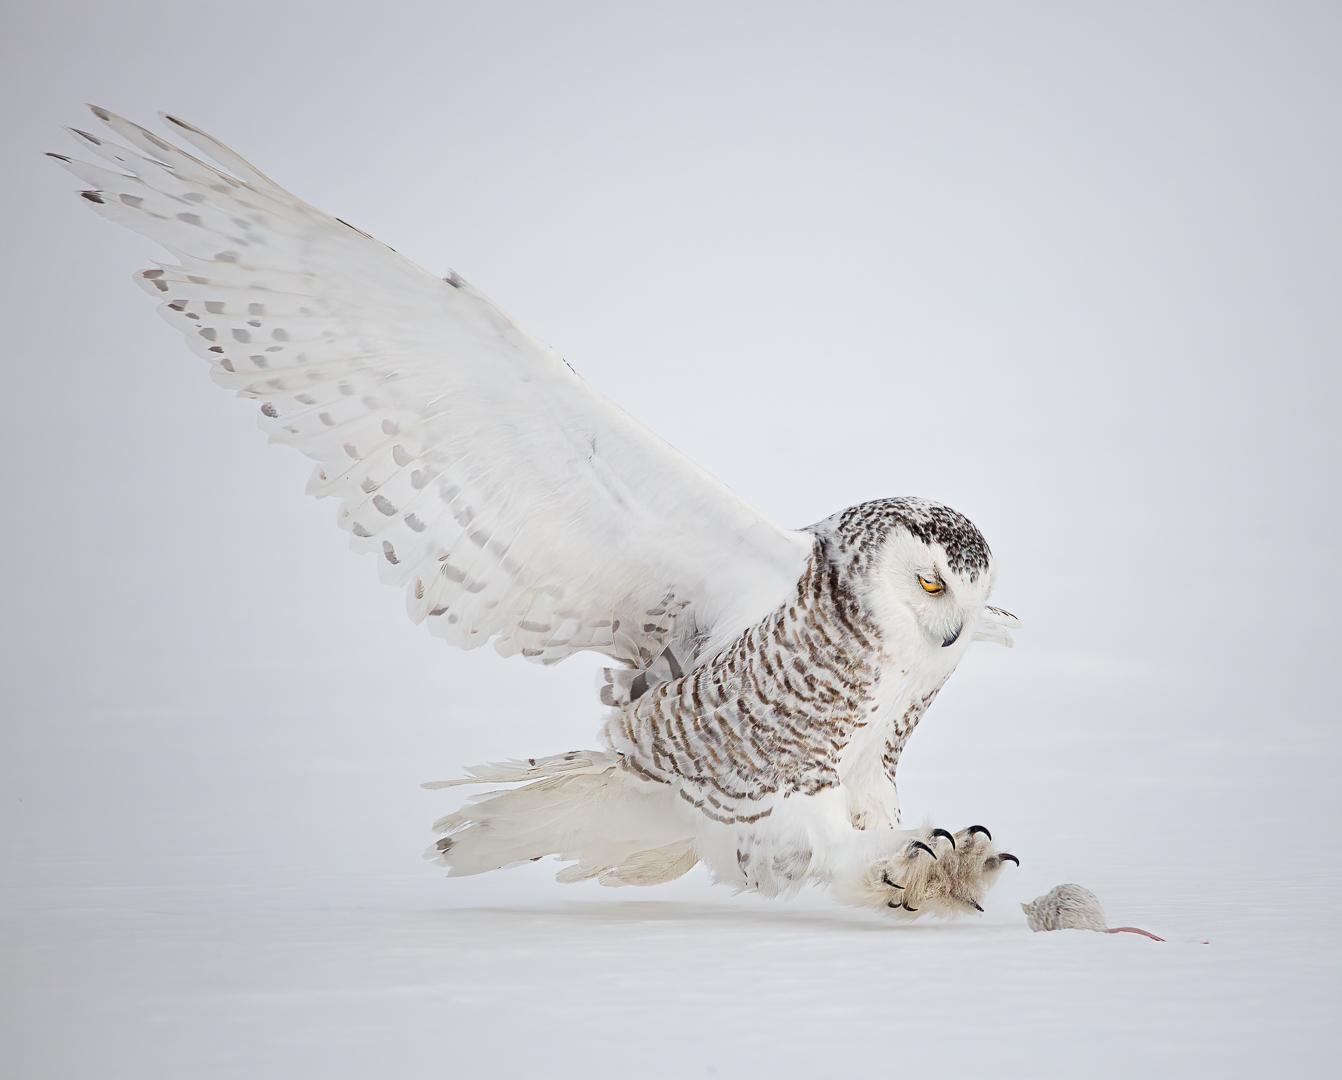 Snowy Owl Attack